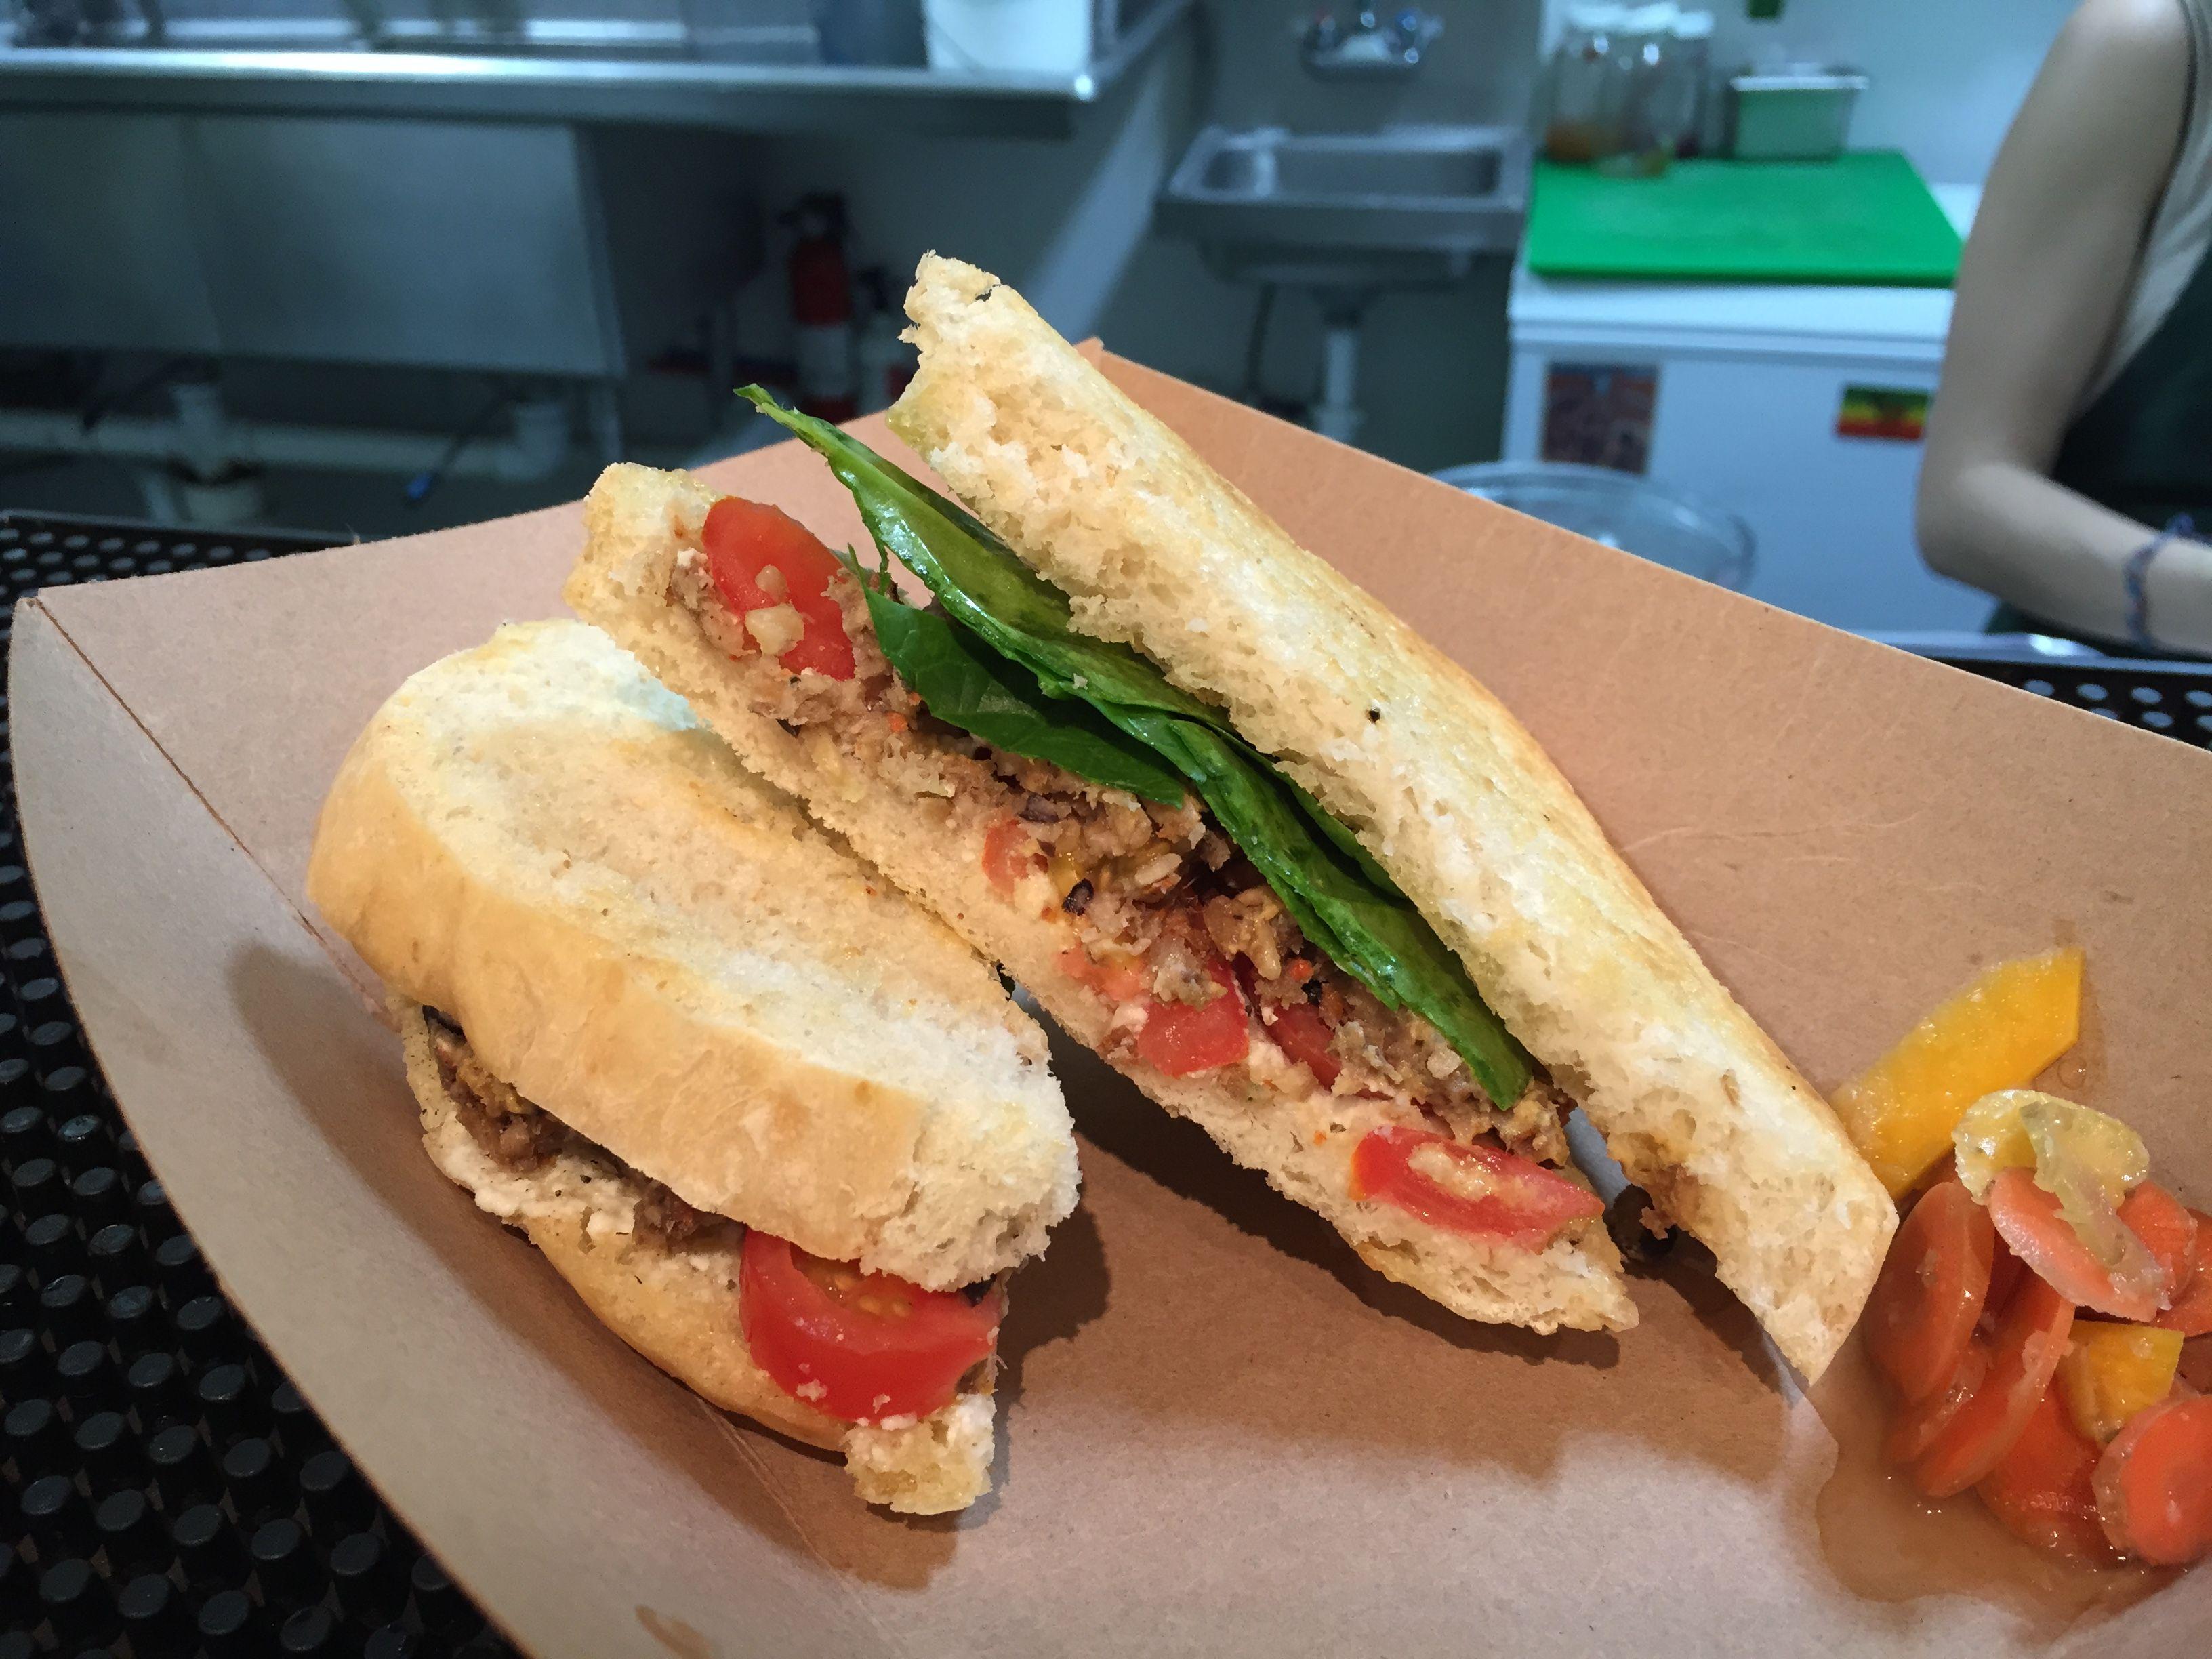 10 New Orleans Dishes For Raw Vegan Paleo Vegetarian And Gluten Free Diets Gonola Com Vegan Chipotle Vegan Restaurants Vegetarian